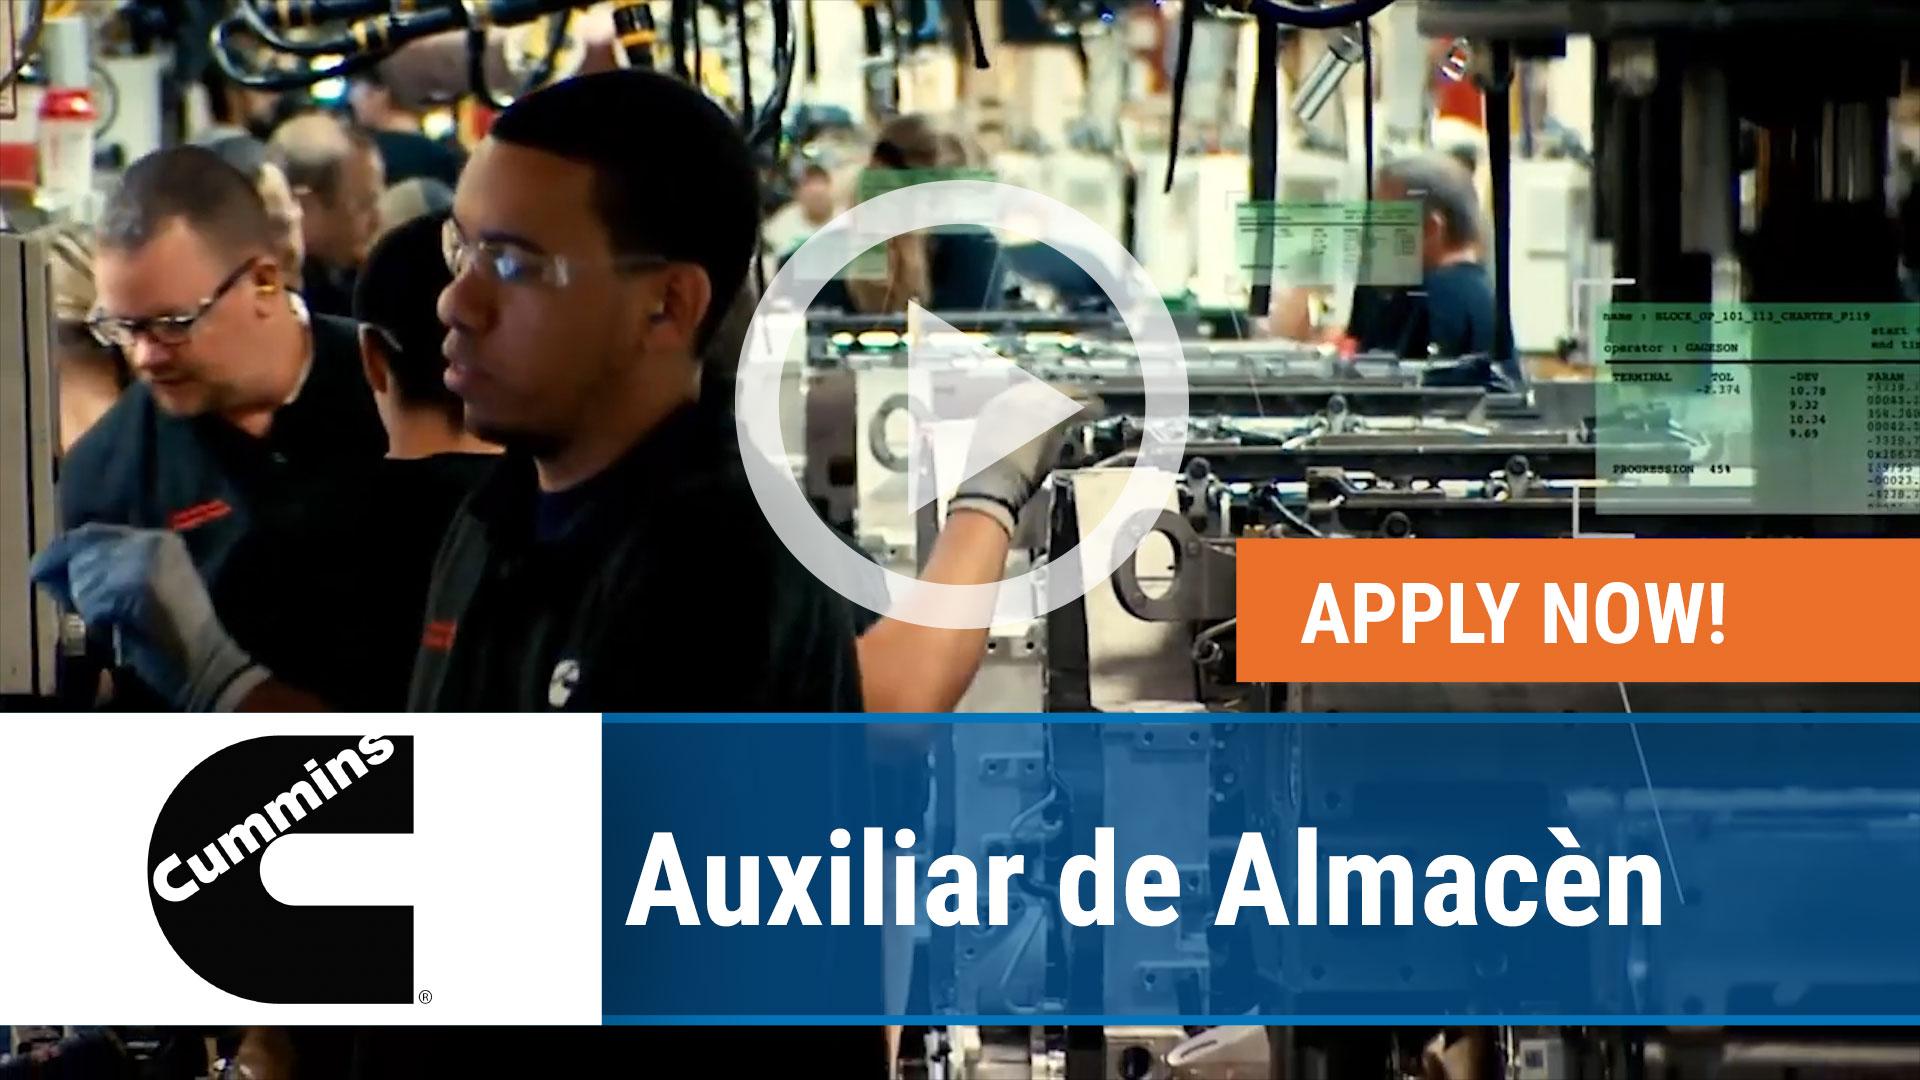 Watch our careers video for available job opening Auxiliar de Almacèn in San Luis Potosí, San Luis Pot